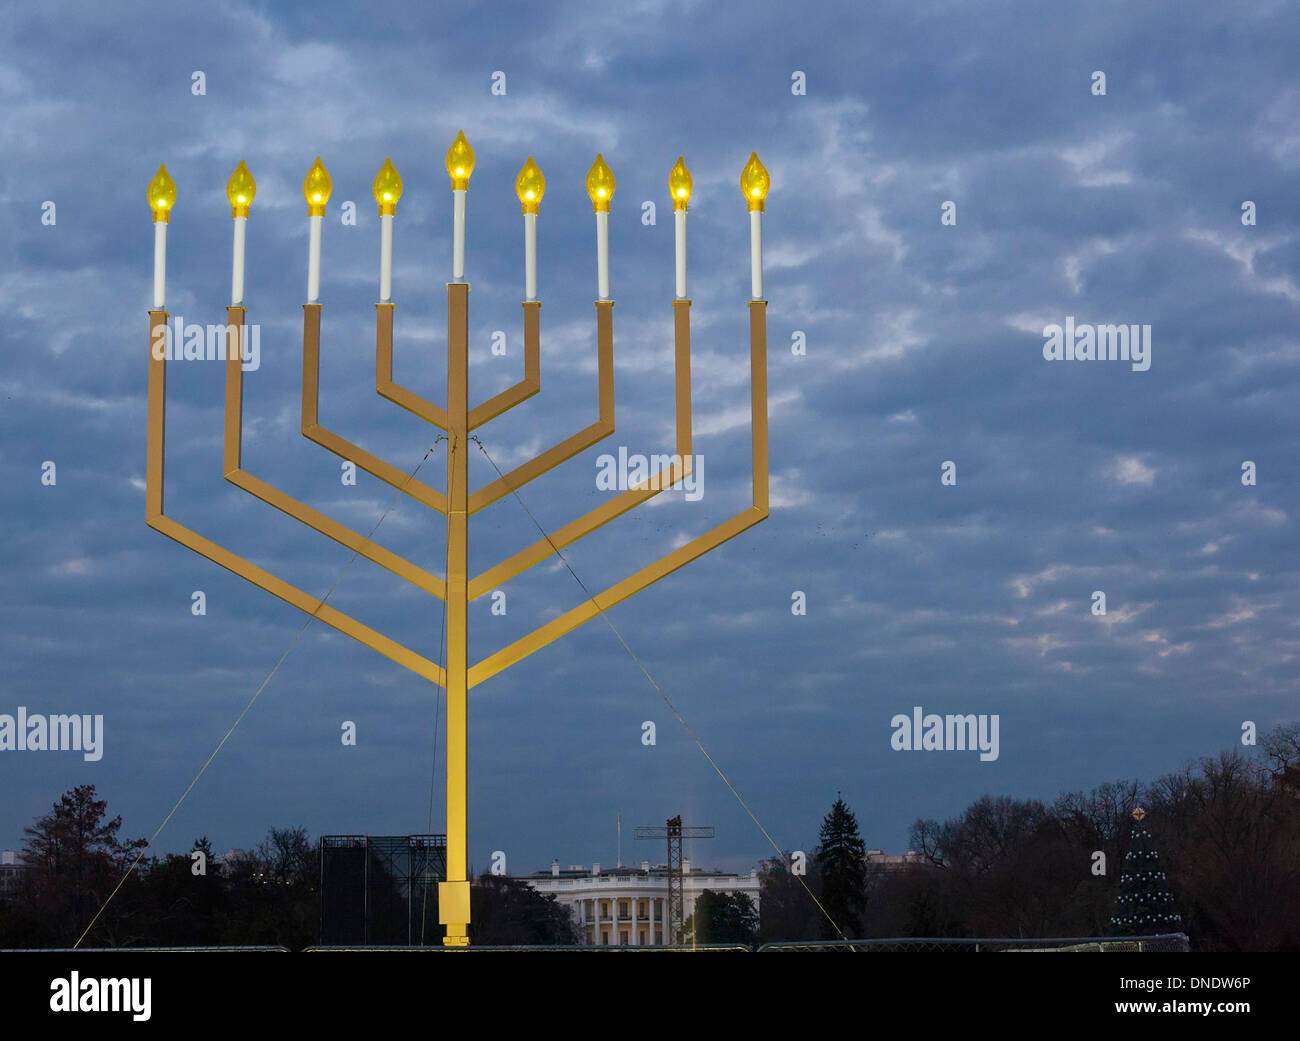 Washington, DC - The National Hanukkah Menorah on the Ellipse near the White House. - Stock Image